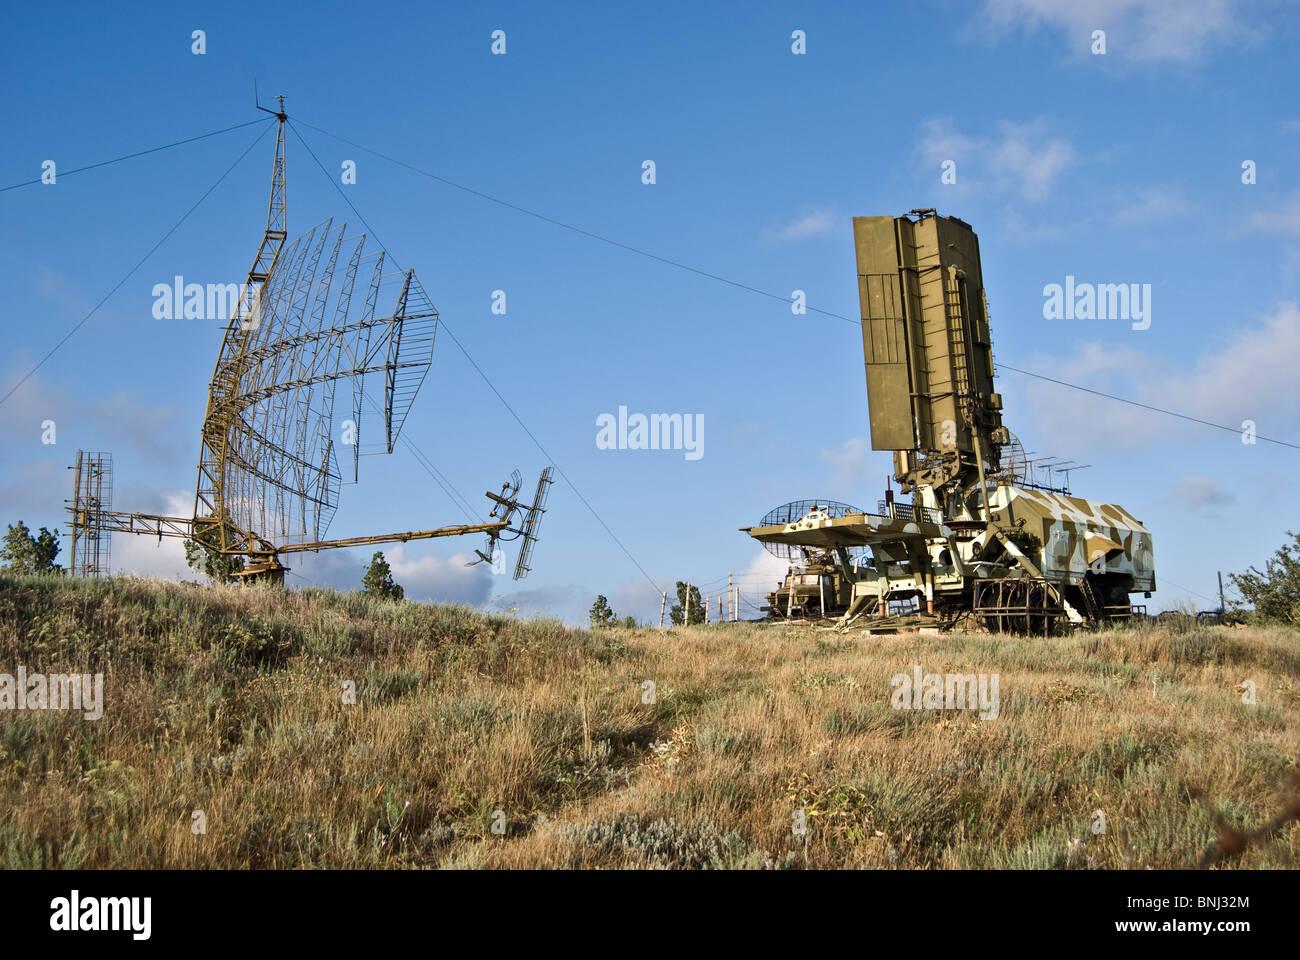 radars on the secret military base - Stock Image